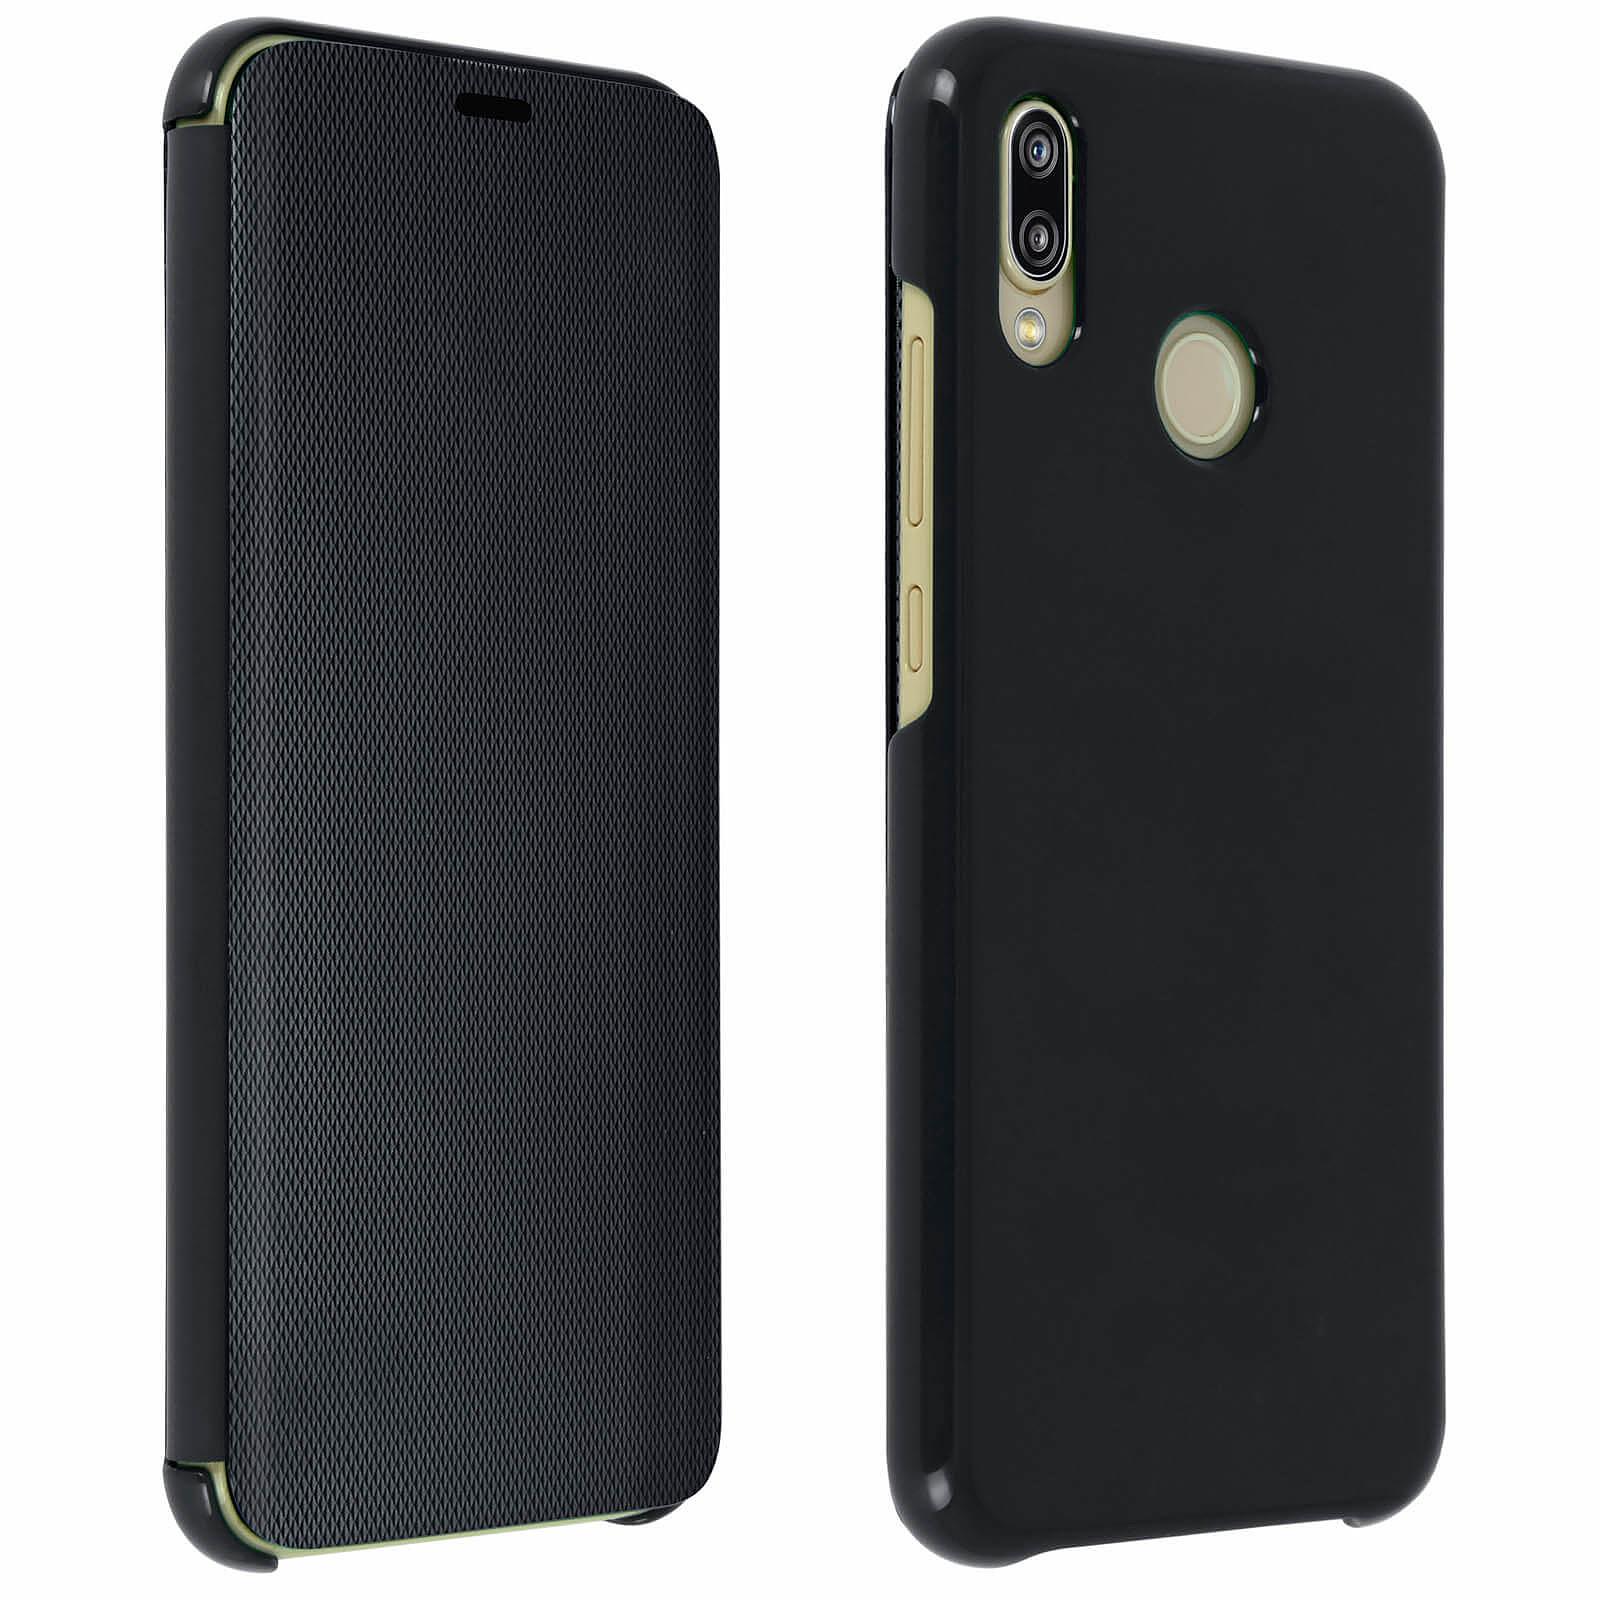 Avizar Etui folio Noir Translucide pour Huawei P20 Lite